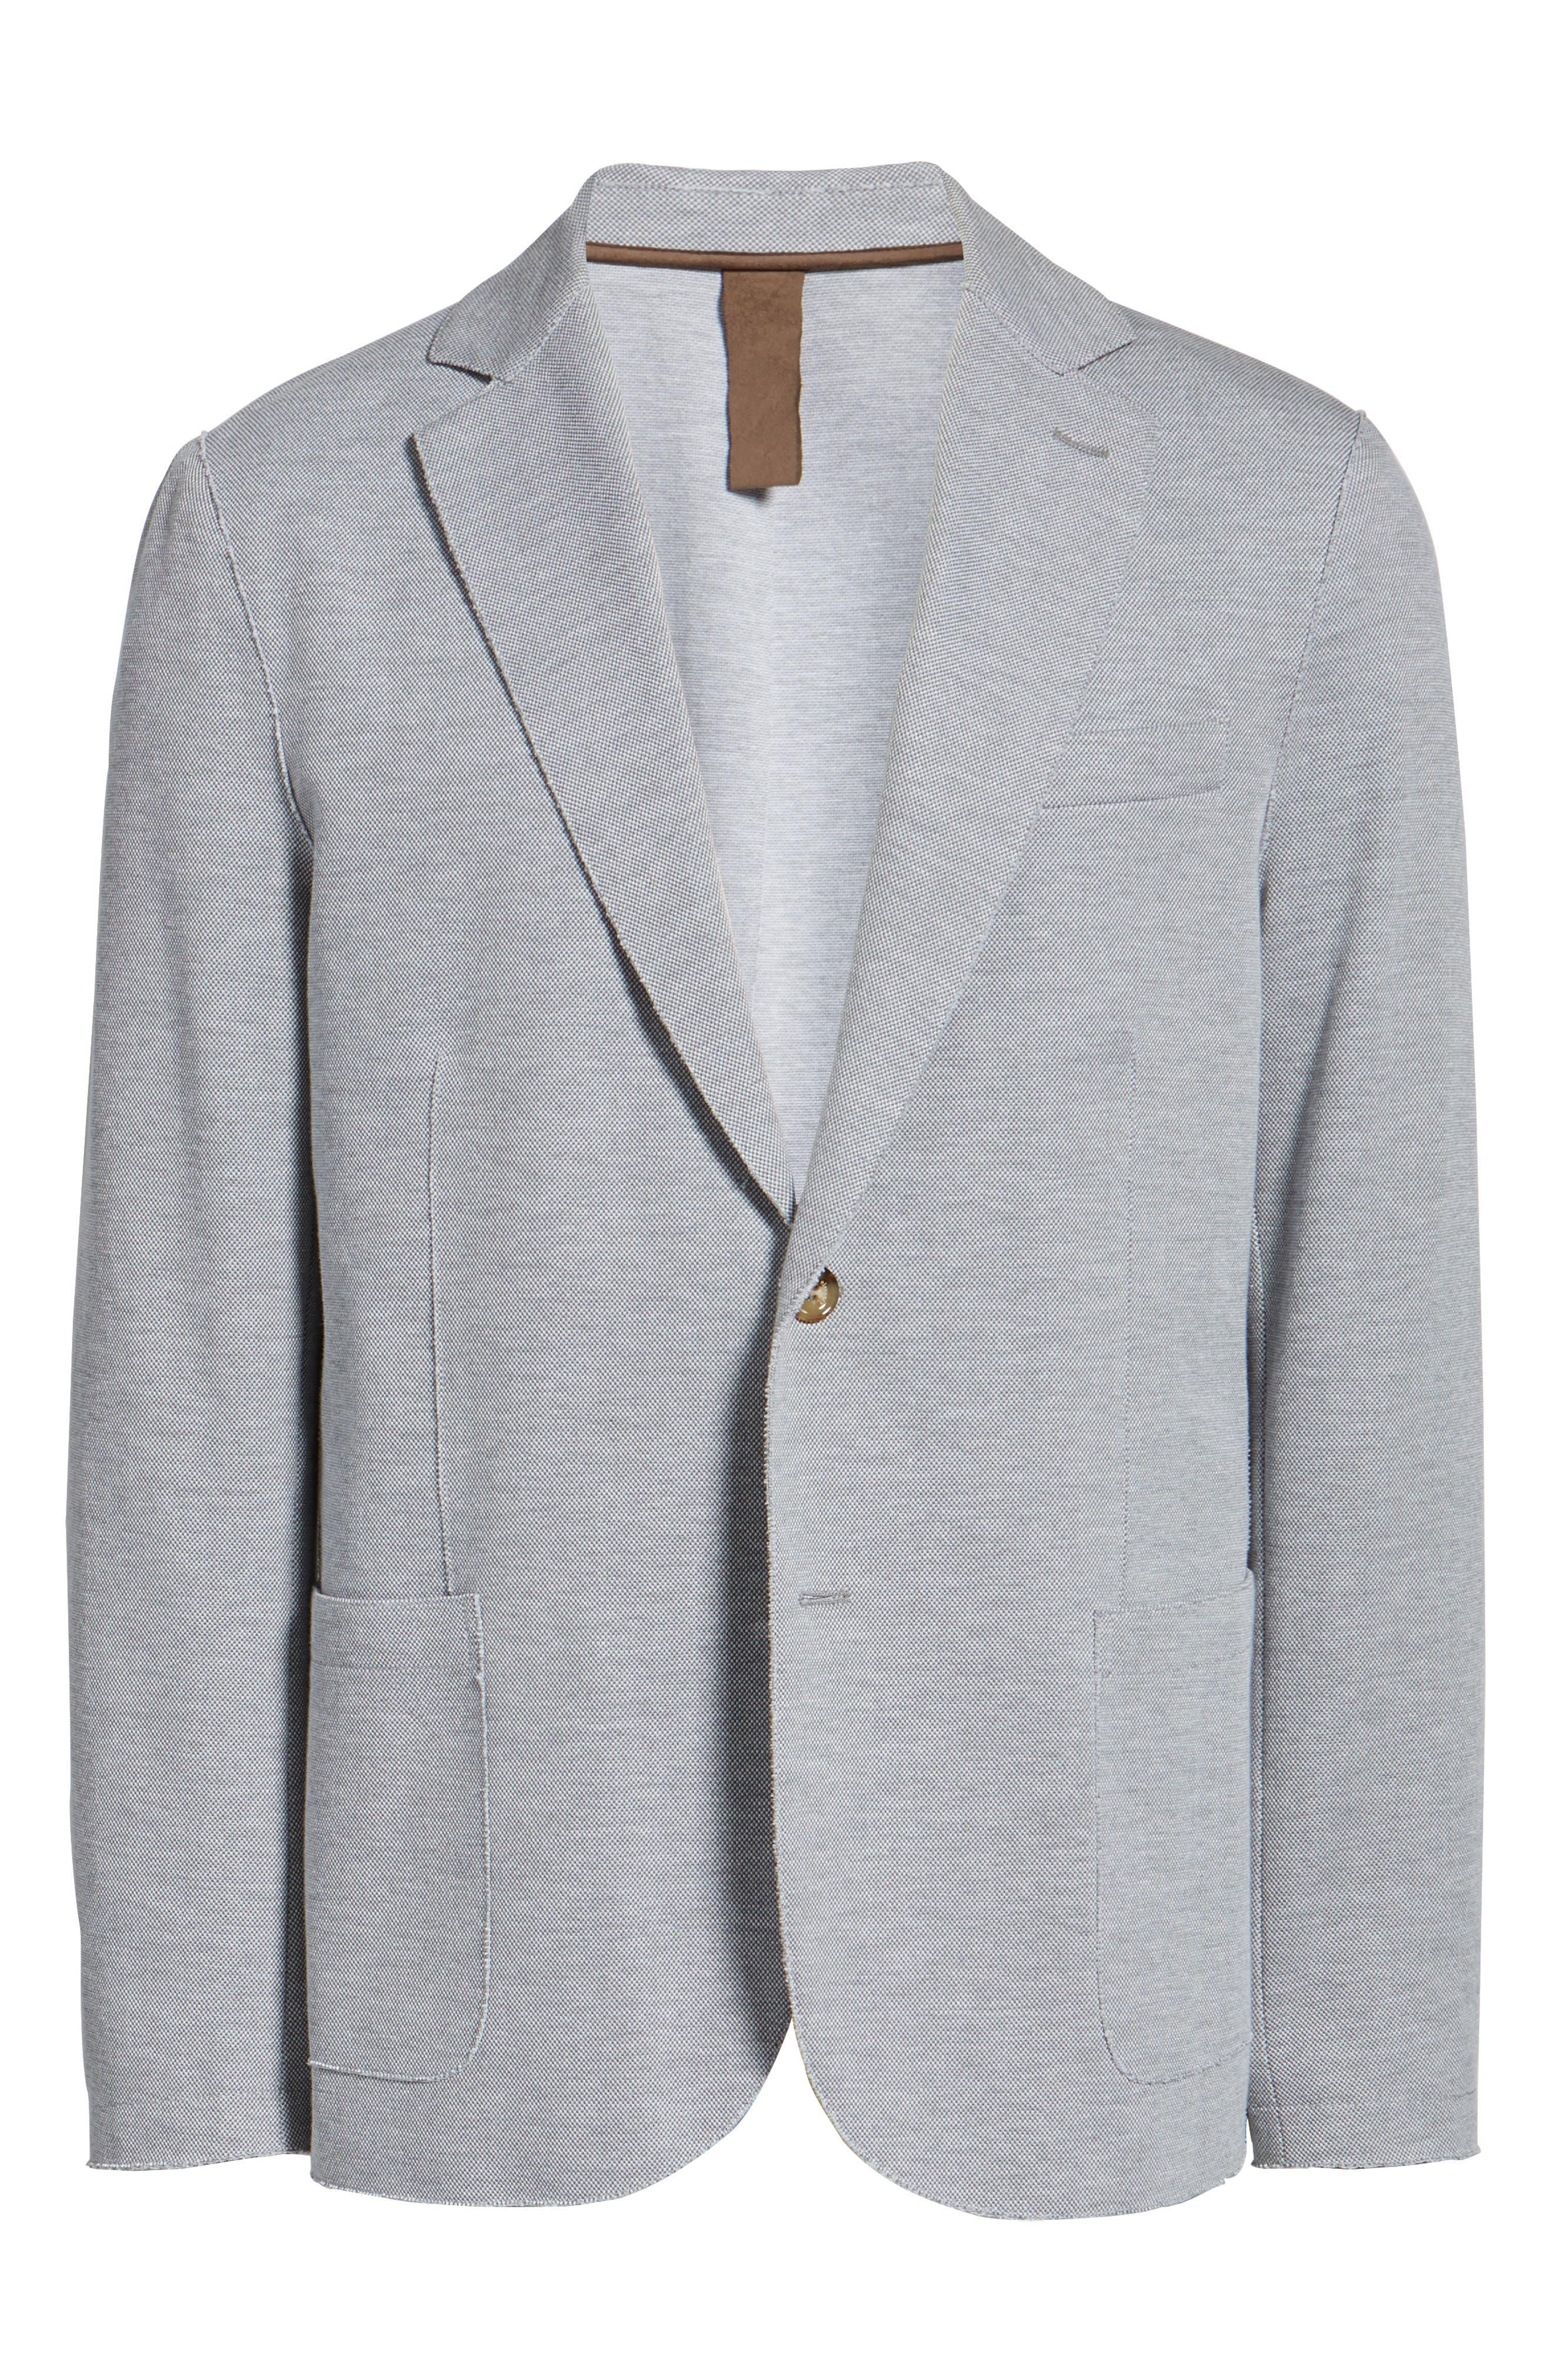 Trim Fit Jersey Blazer,                             Alternate thumbnail 8, color,                             Grey